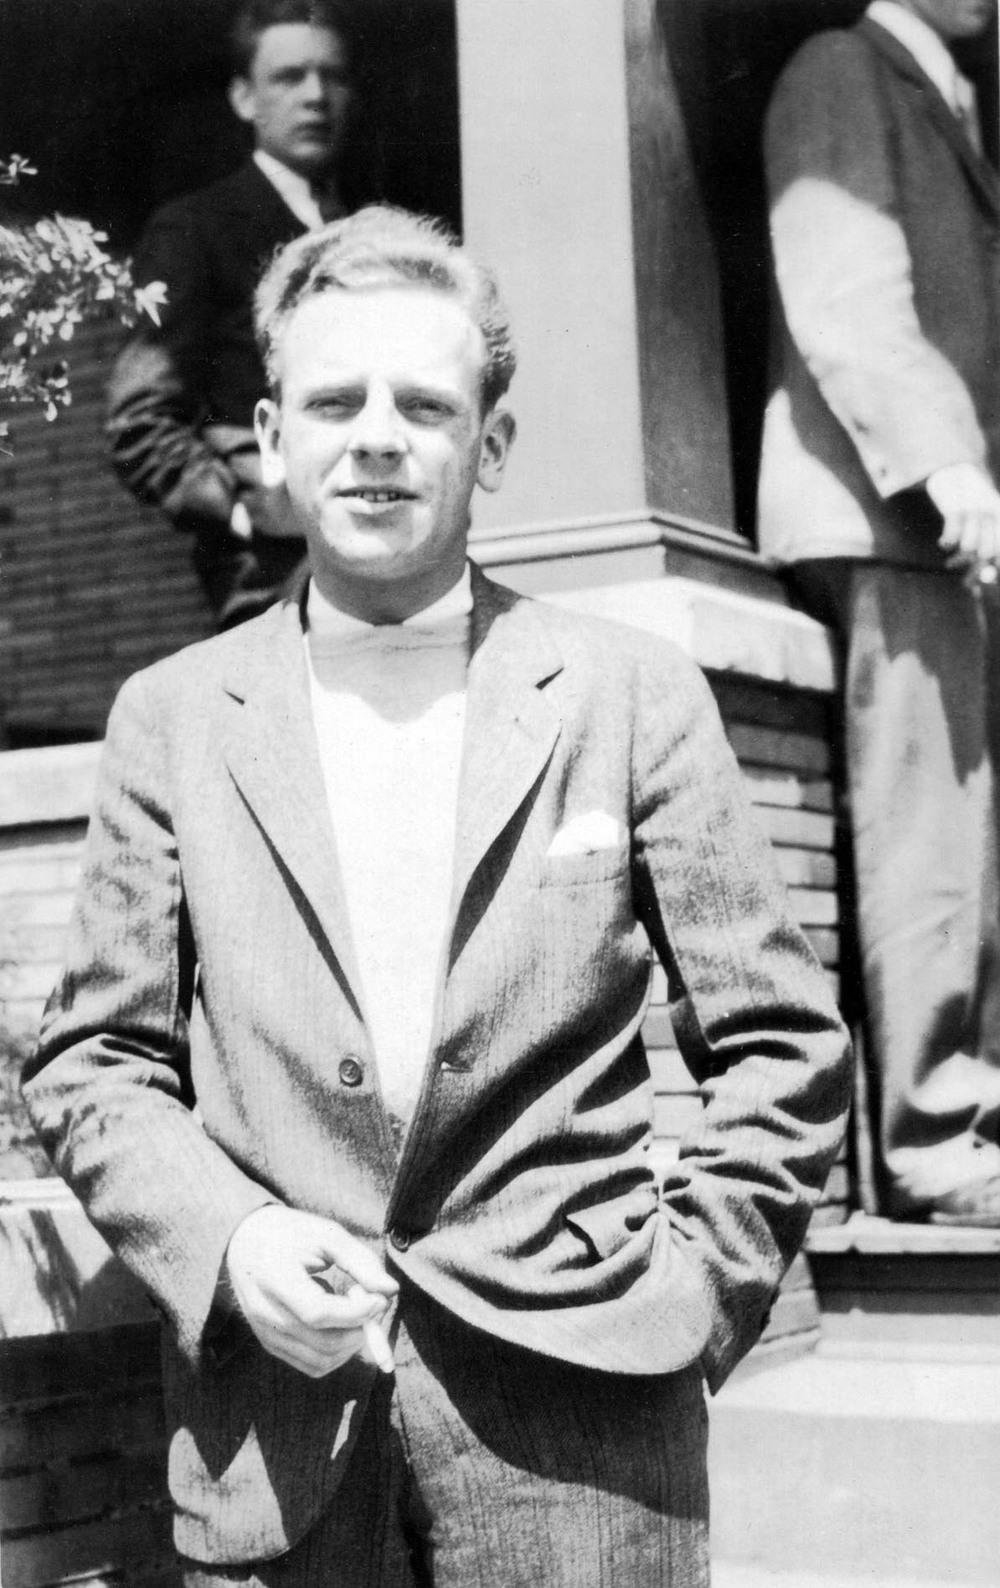 Forrest G. Thompson 1930